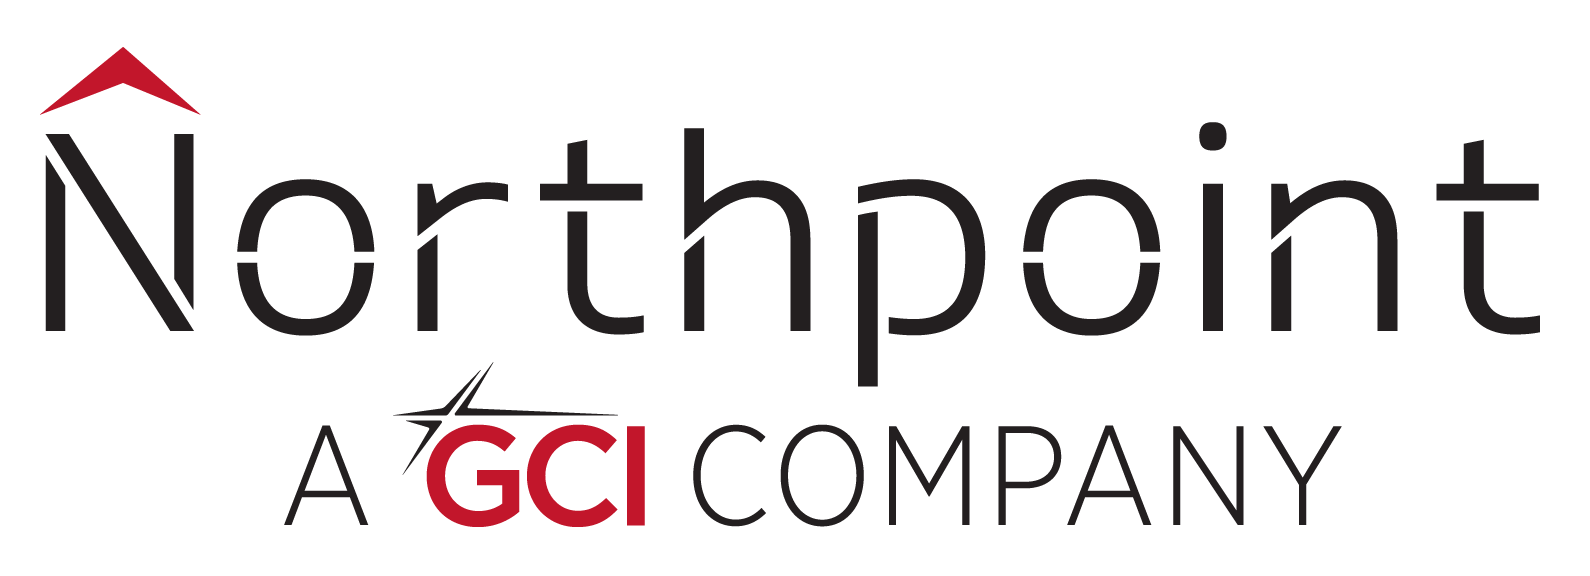 Northpoint, A GCI Company logo